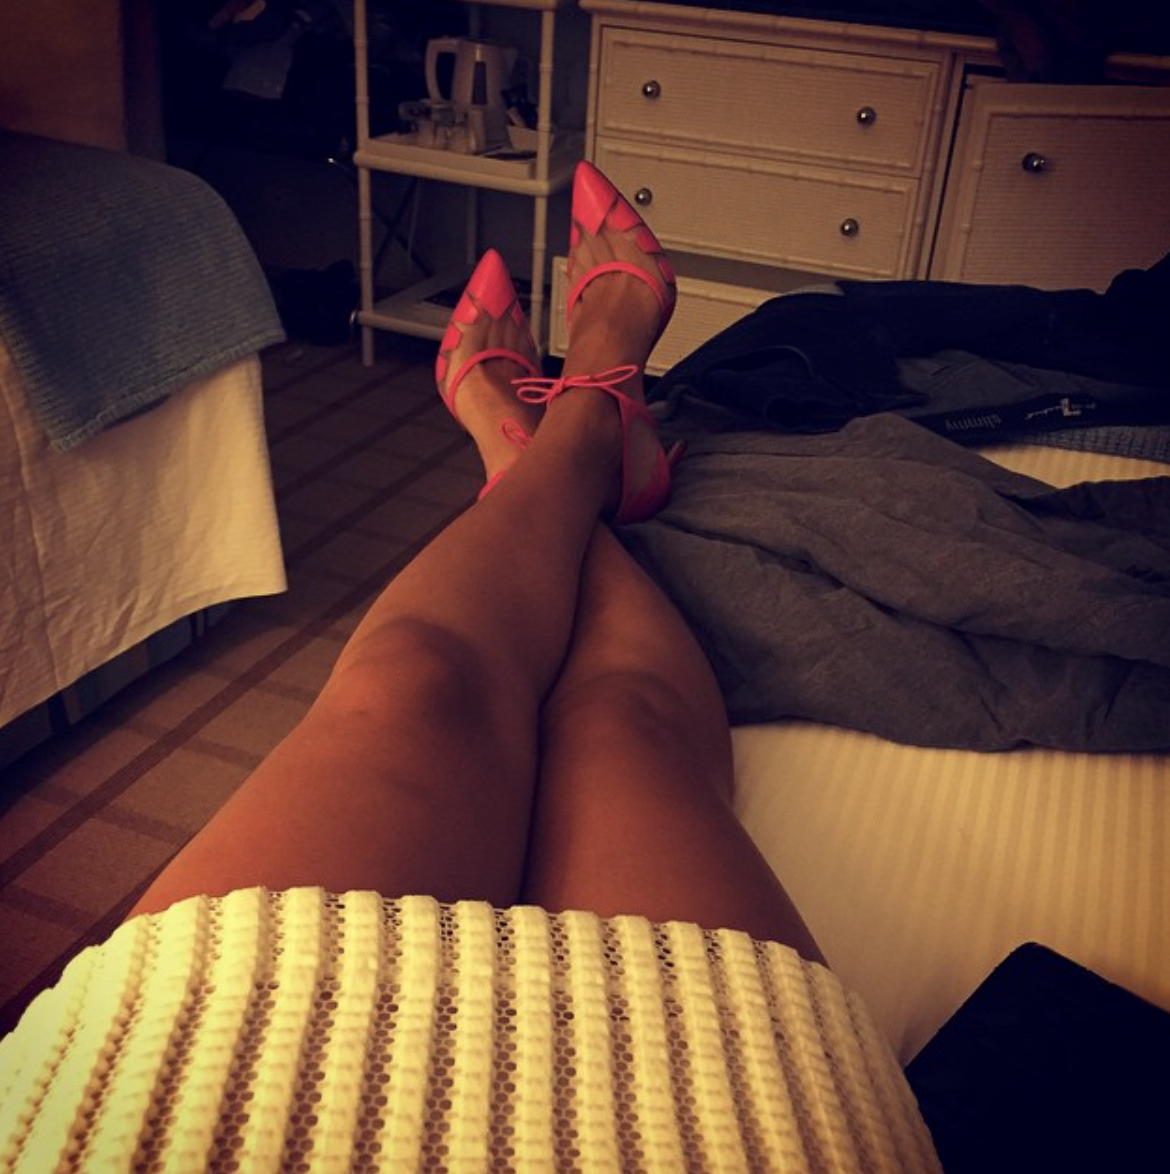 @ jadecnicholas   Feet up before the night begins... My current favourite shoe, Thursday was black, Friday grey and tonight pink  #lana   #Biondacastana   #girlinbc   #MonacoGP